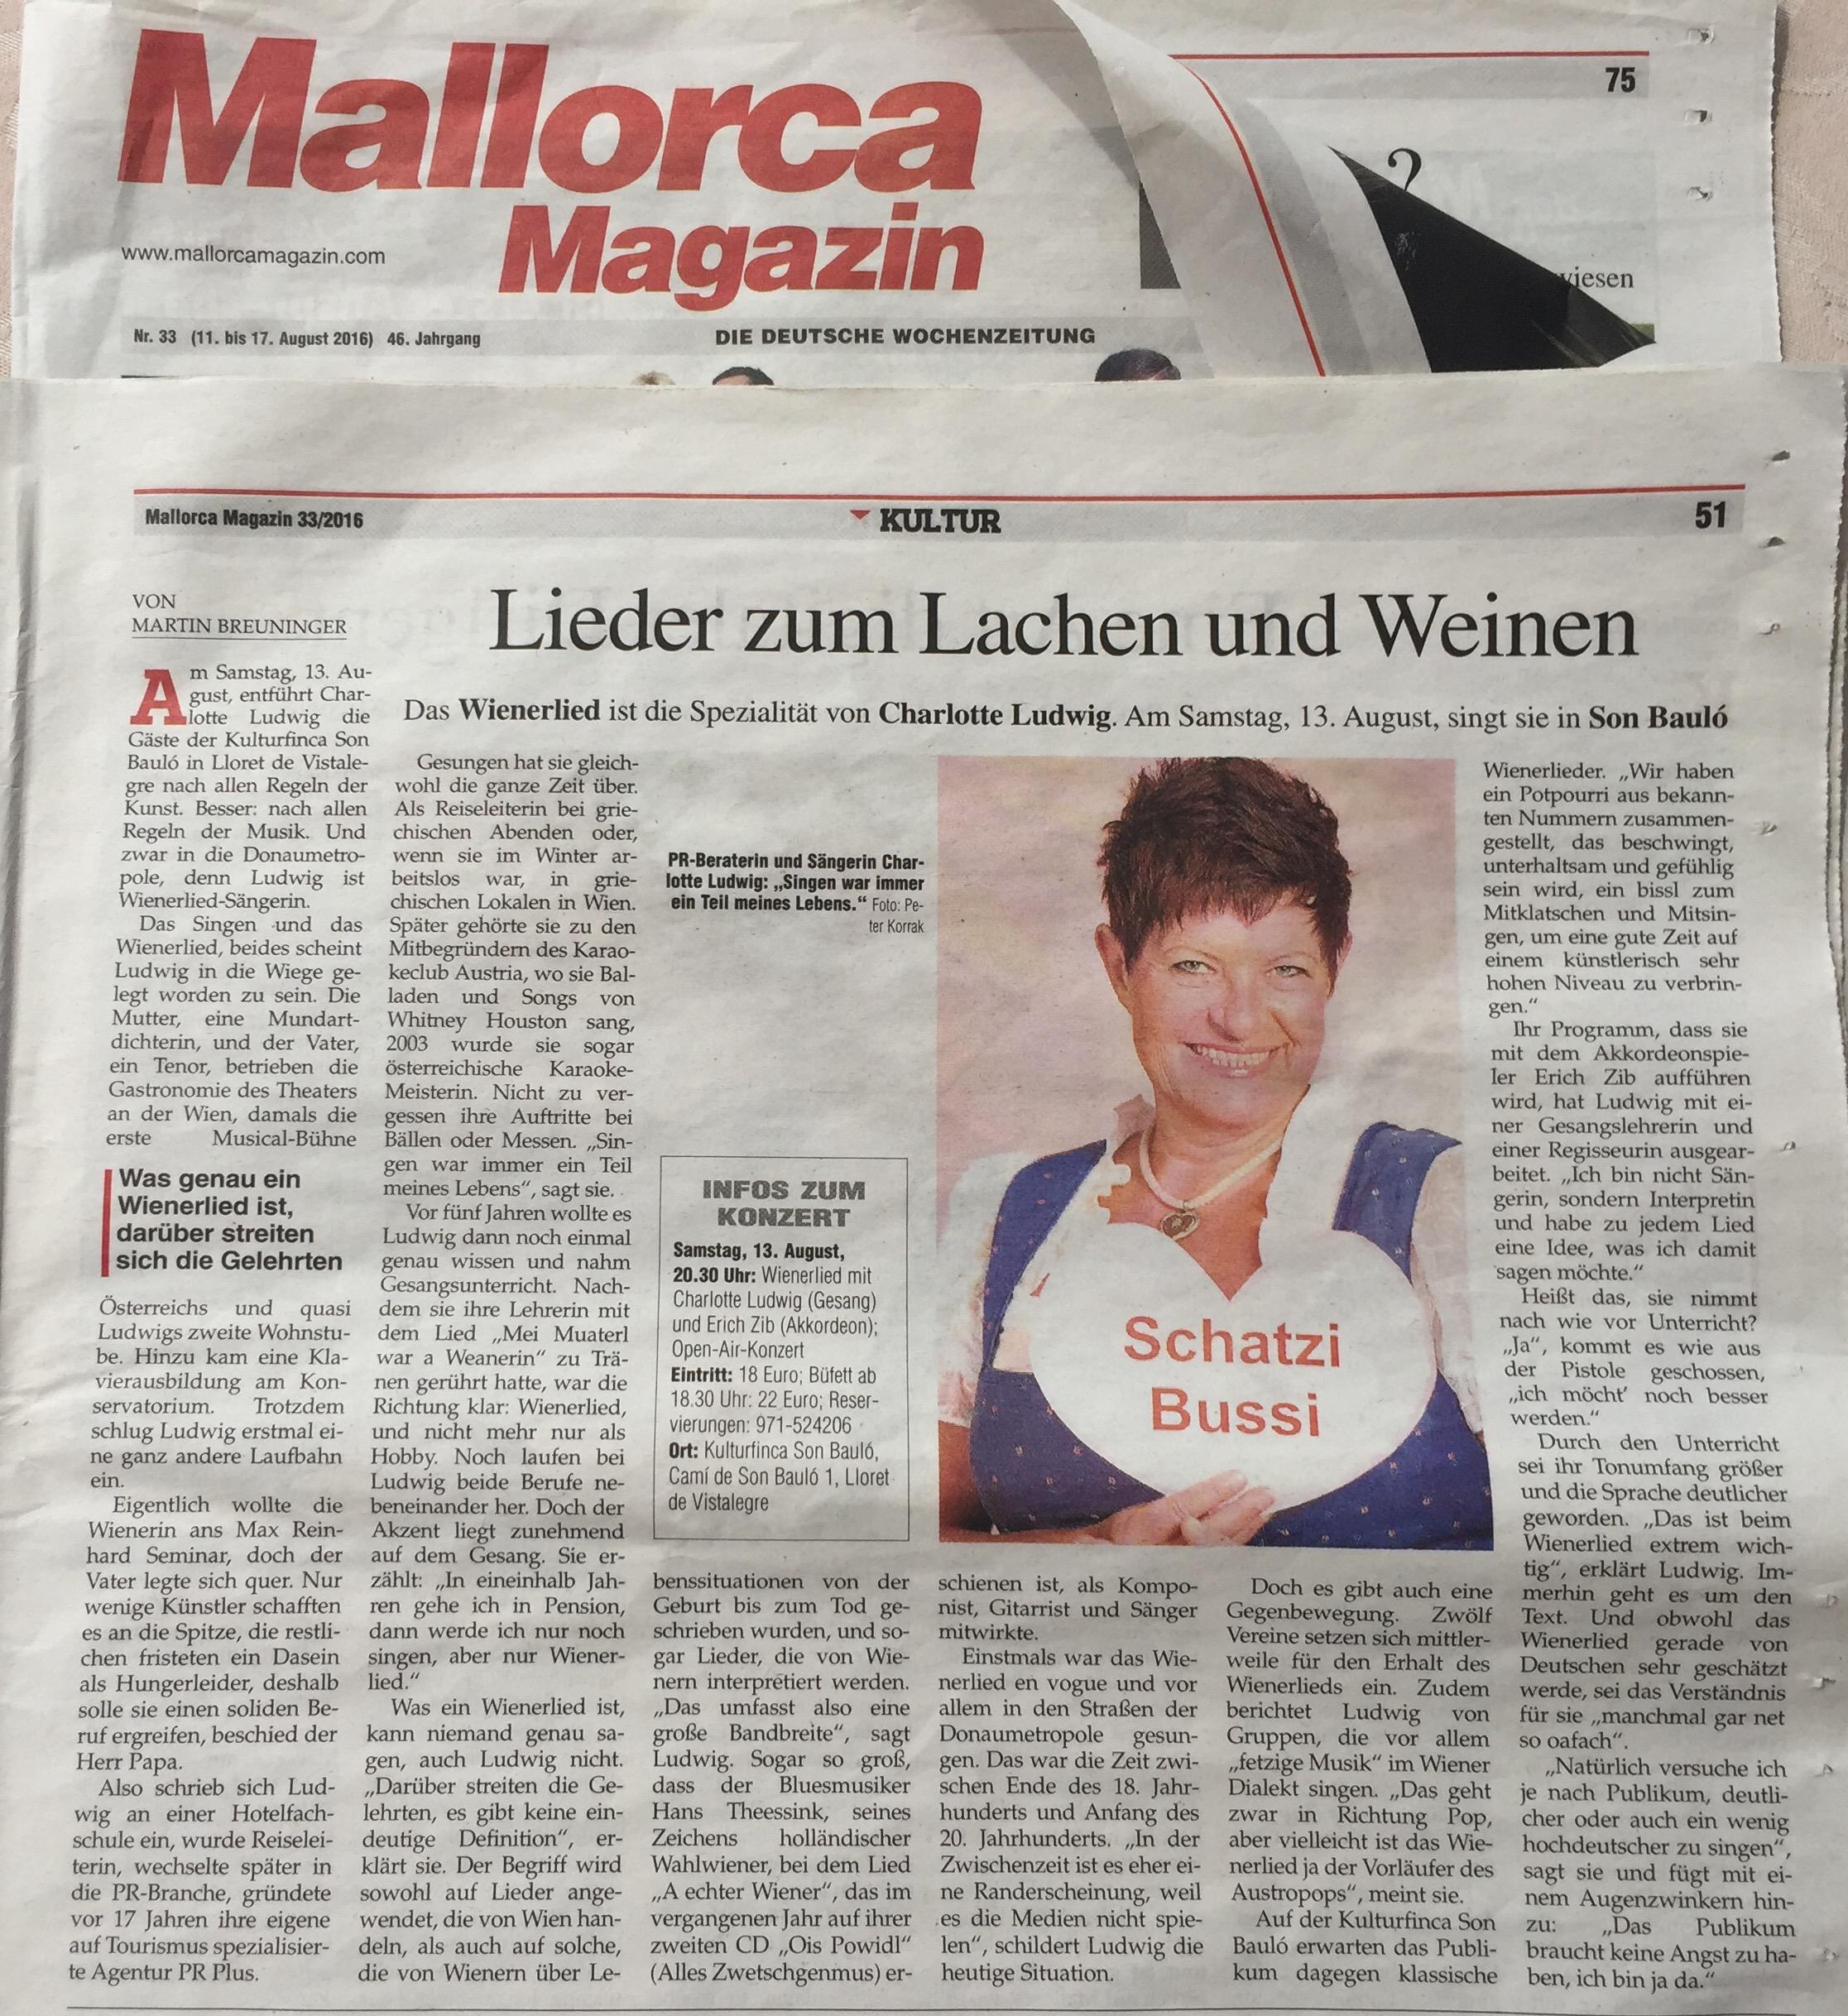 2016-08-12 Mallorca Magazin